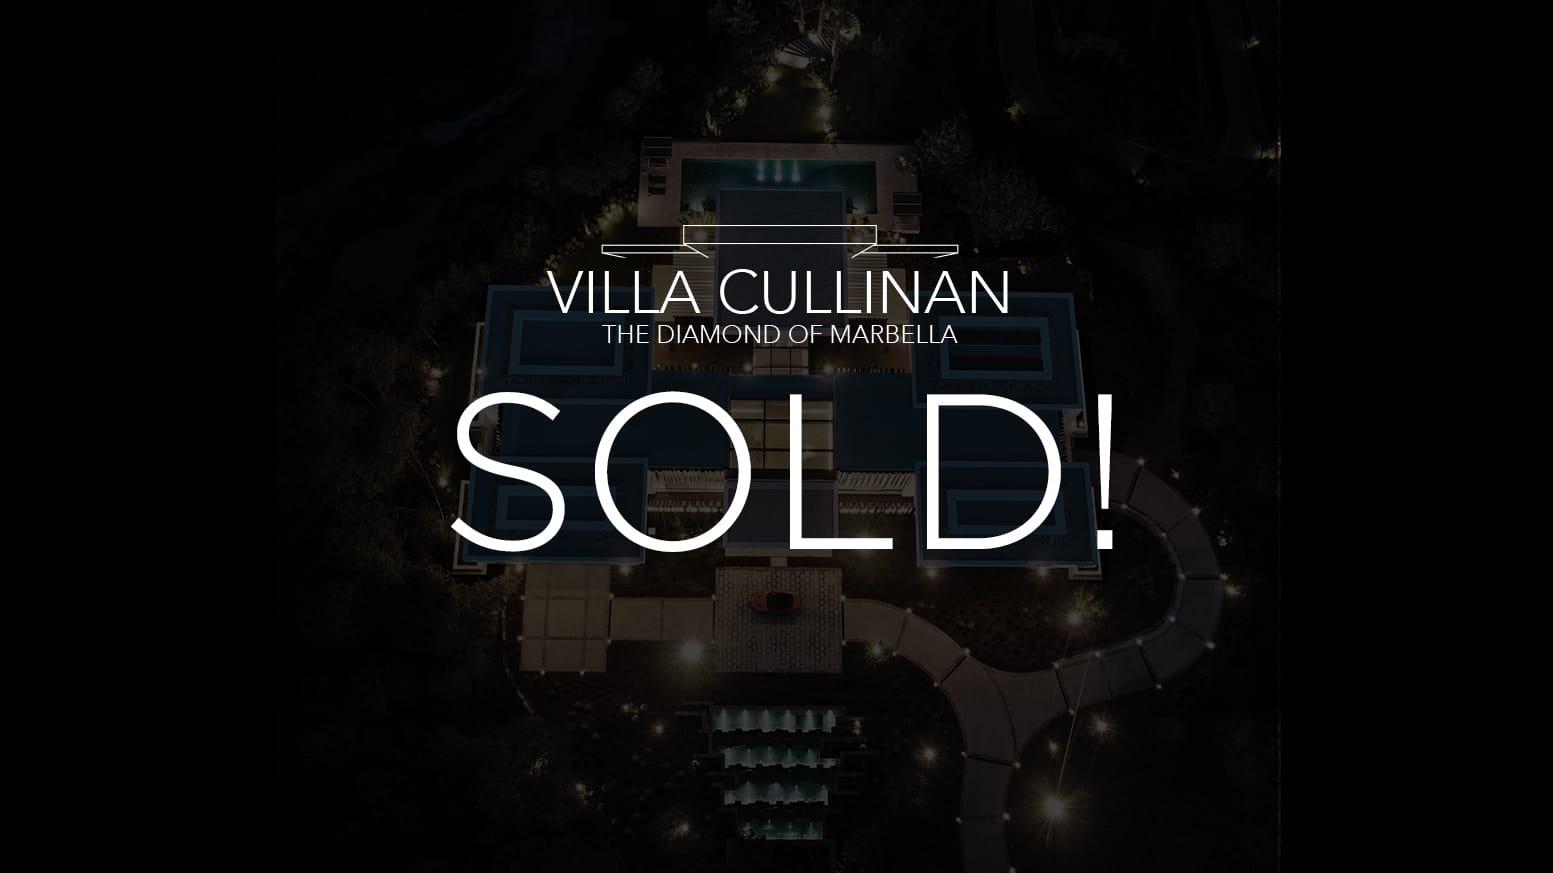 CULLINAN SOLD